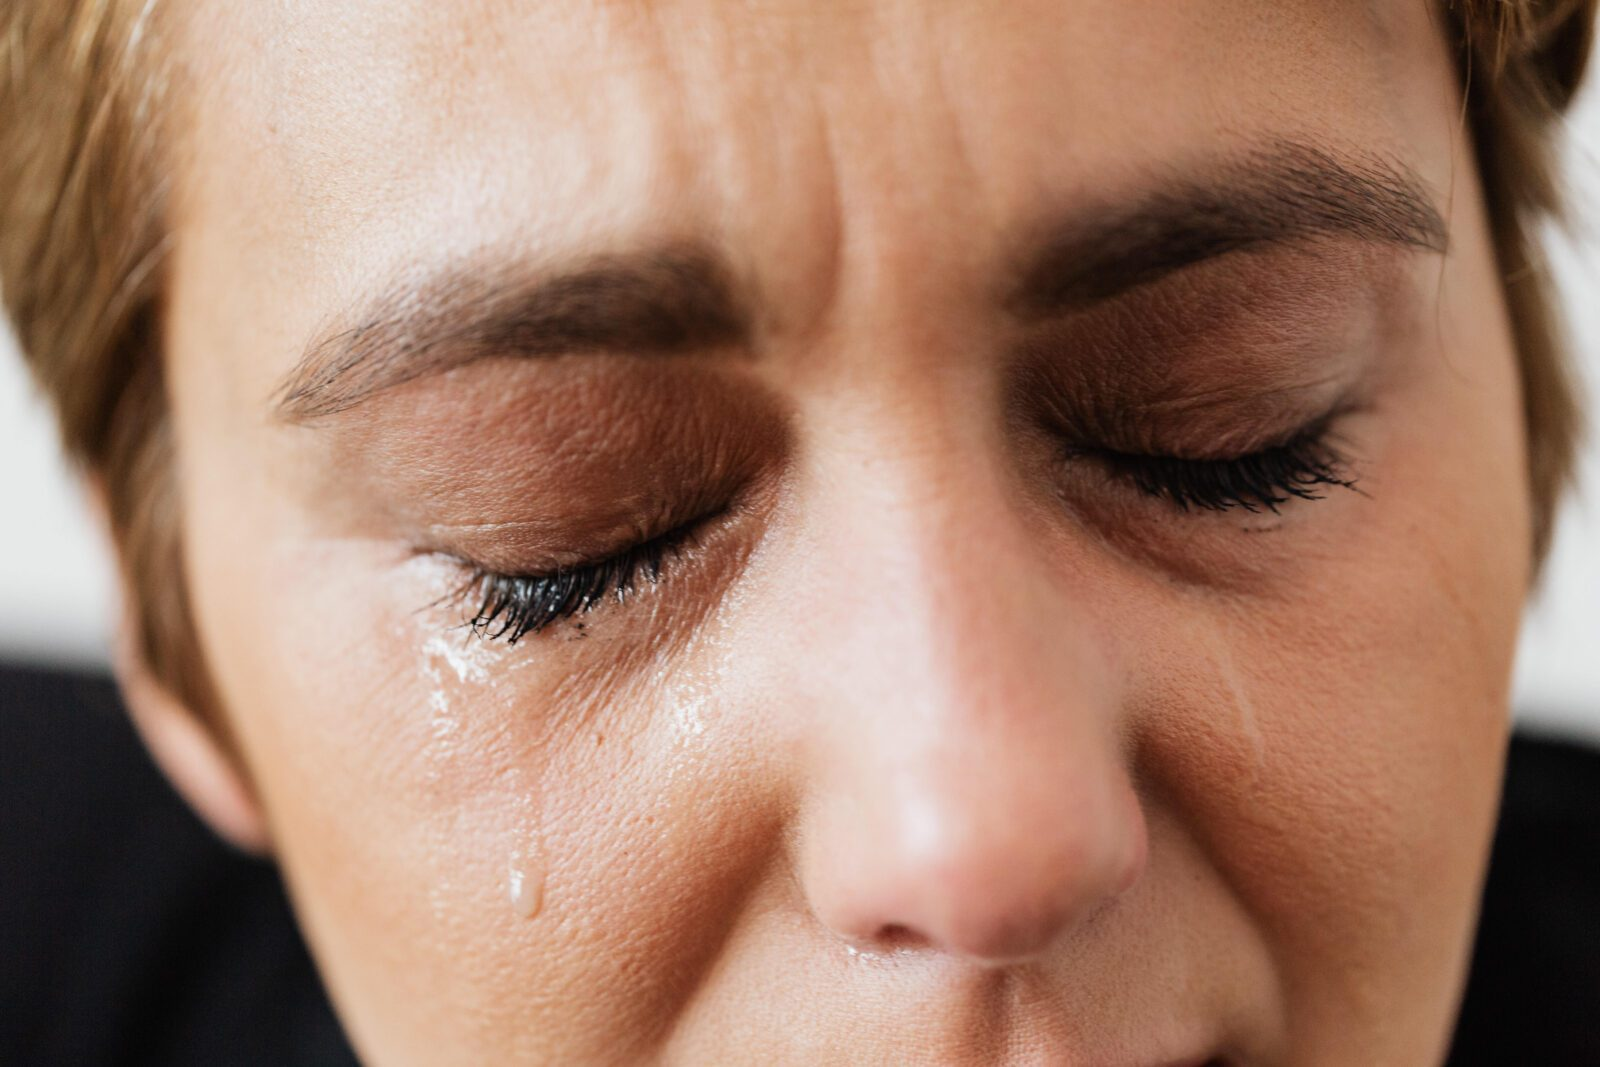 Tears on face of woman with agoraphobia